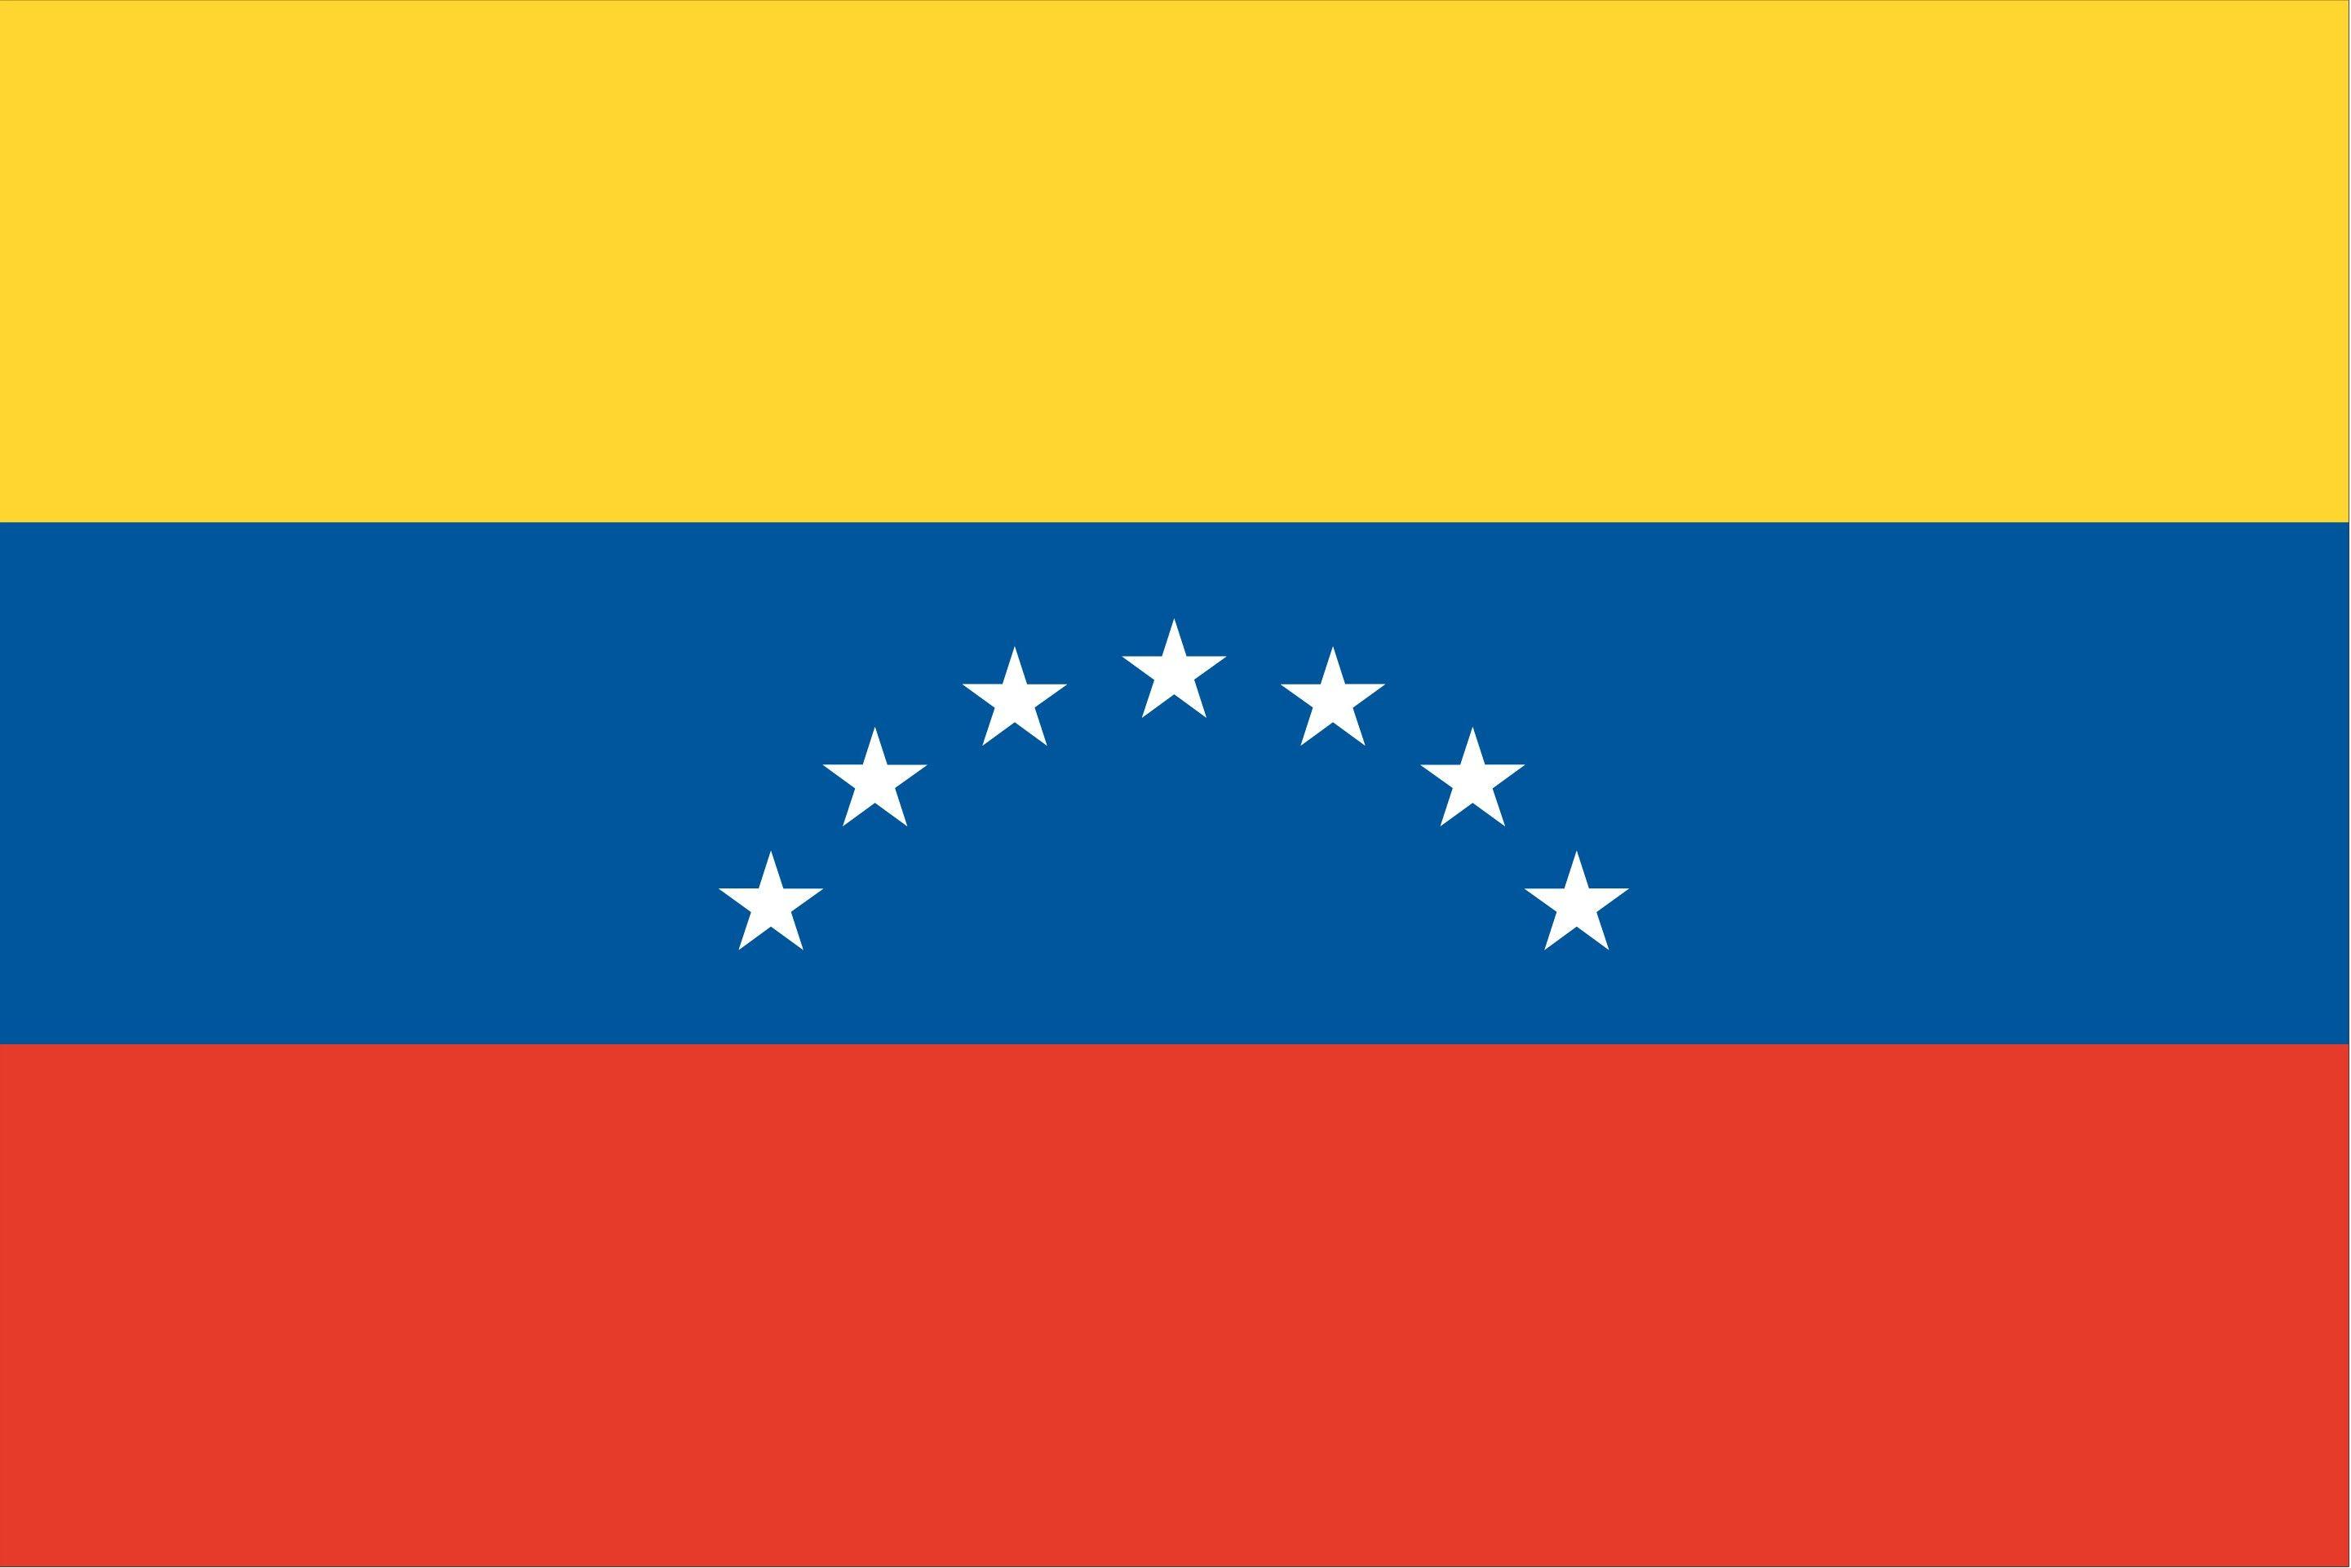 Bandera De Venezuela Png